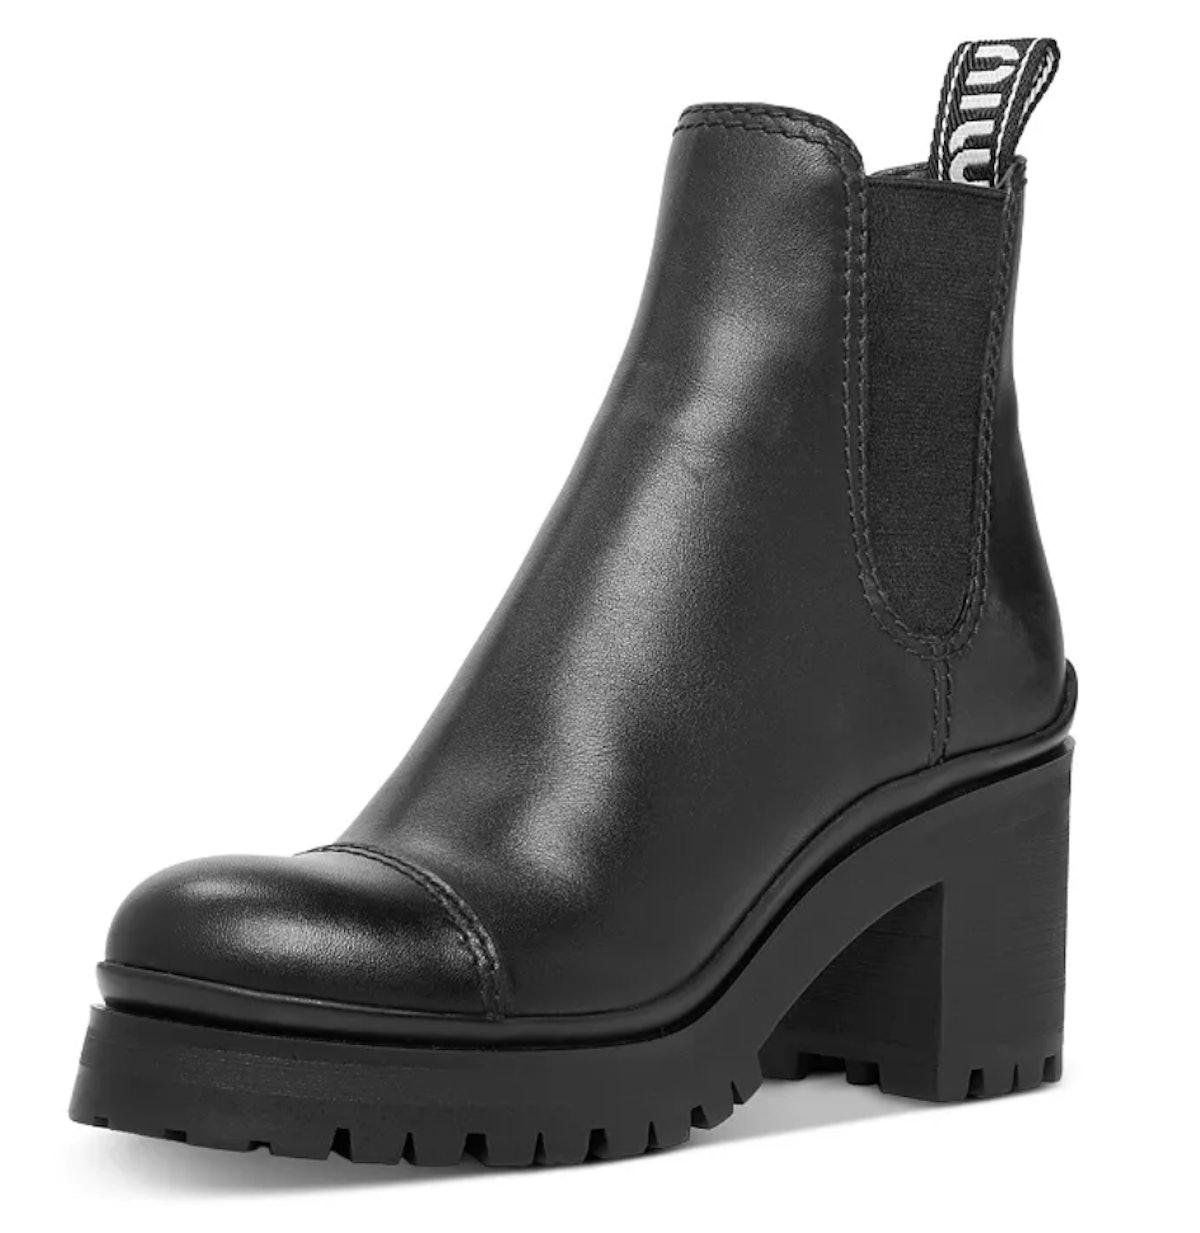 Miu Miu Women's Leather Platform Booties in black.